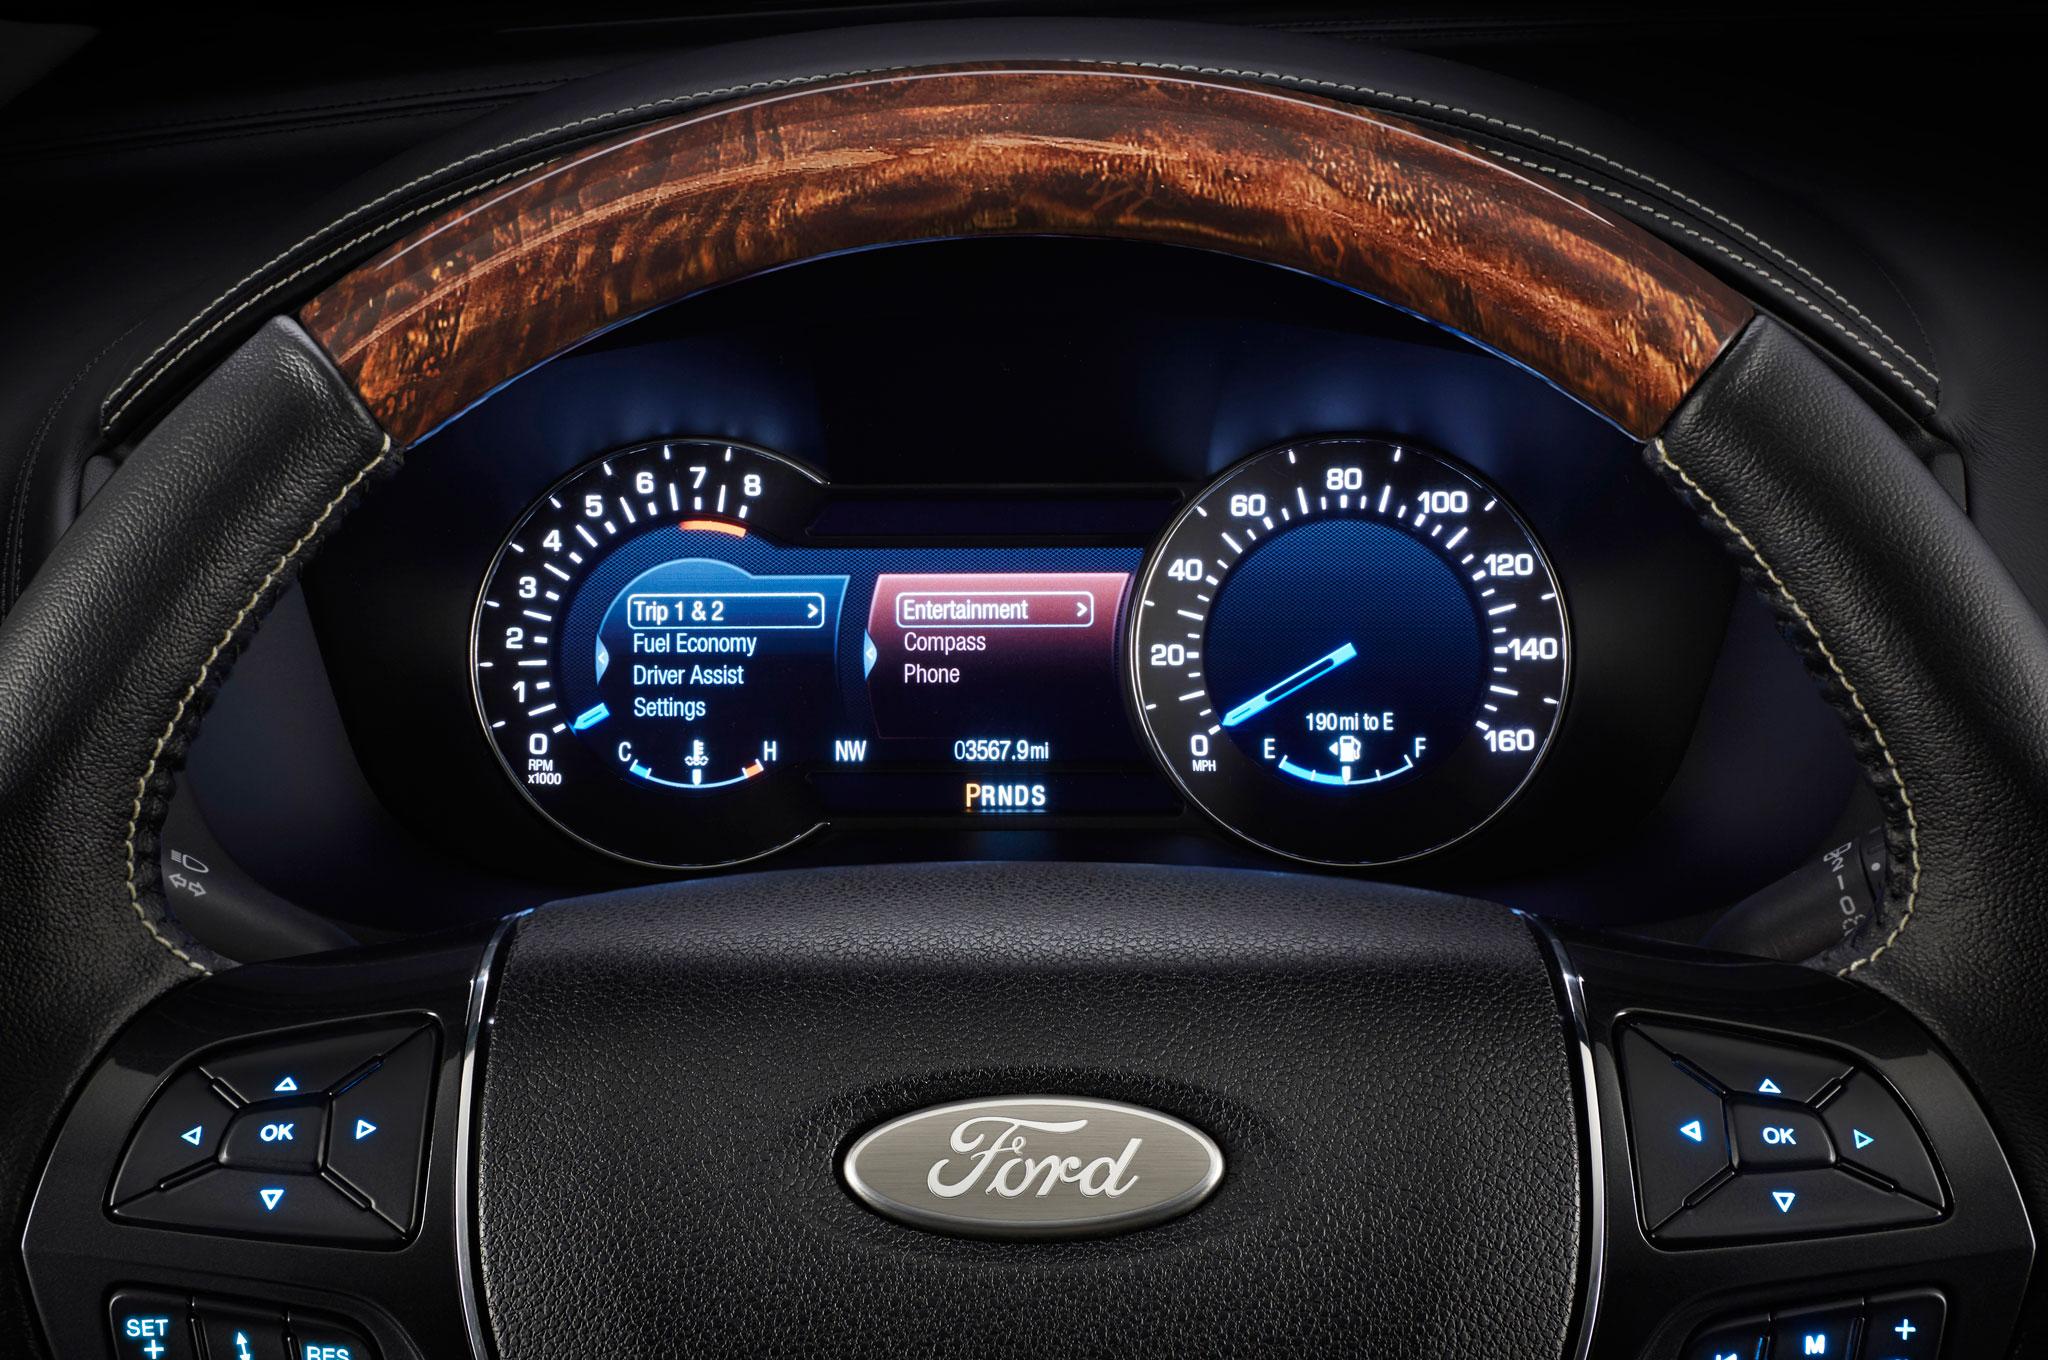 2014 Ford Explorer Xlt >> 2016 Ford Explorer Adds Platinum Trim and New Engine for L.A. Debut